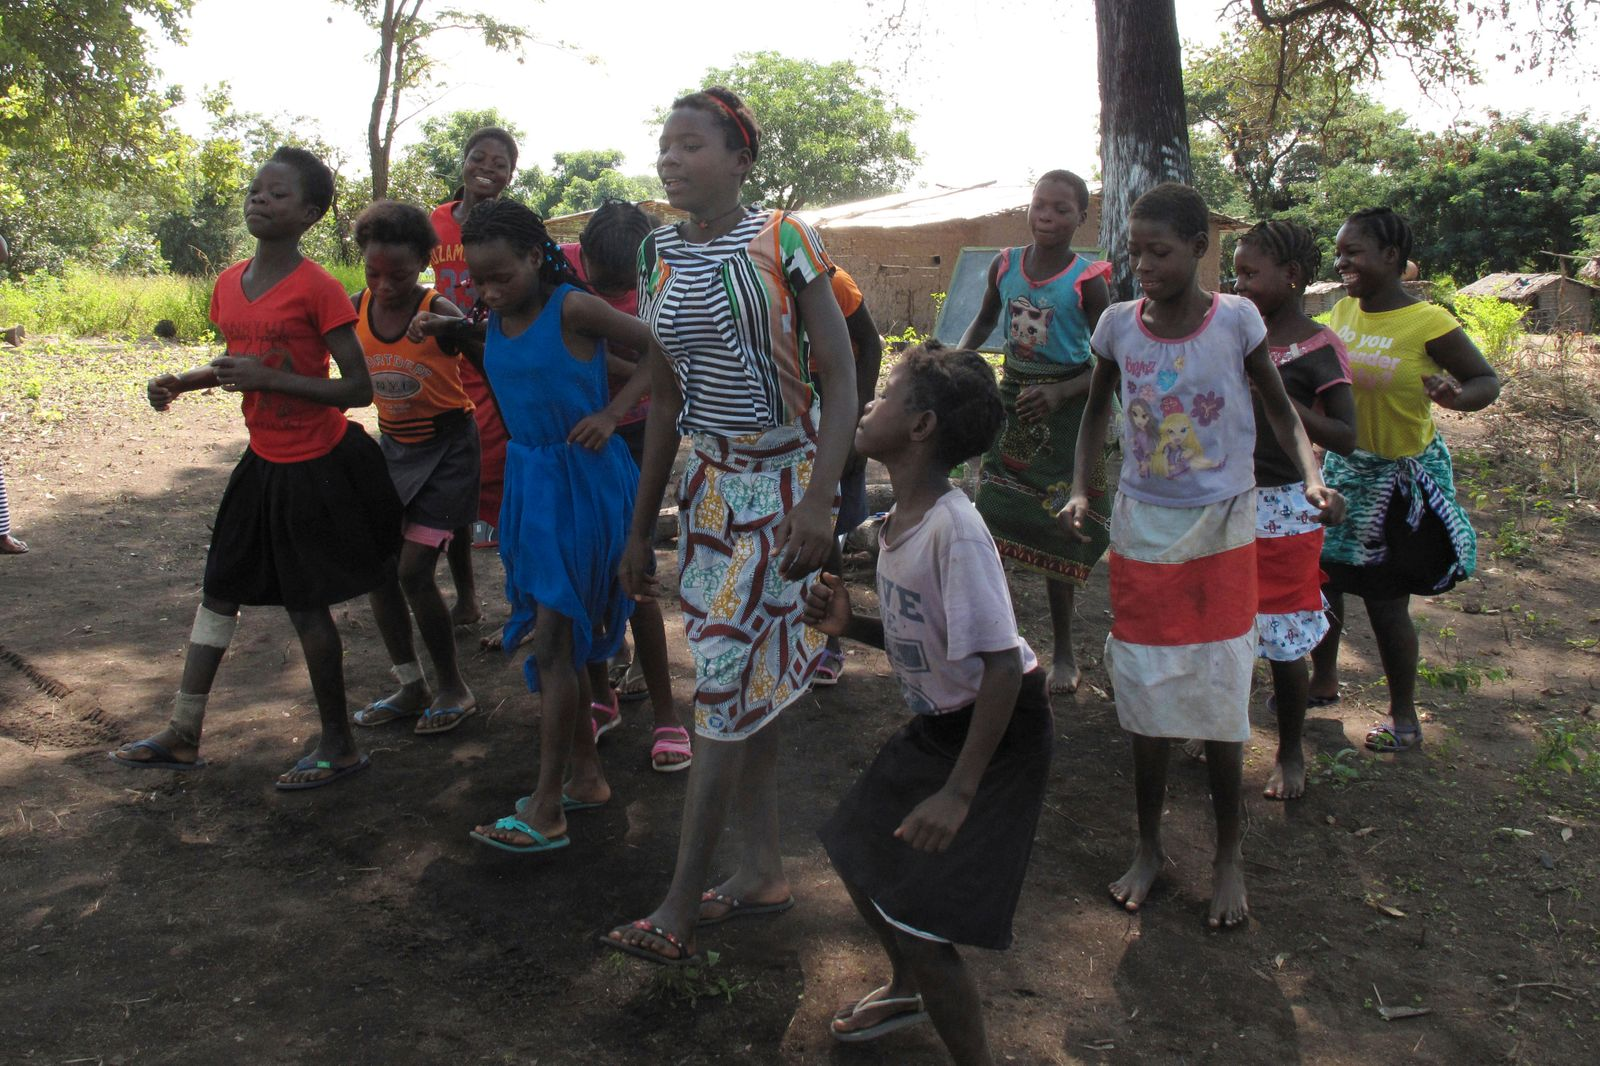 Mozambique Child Marriage